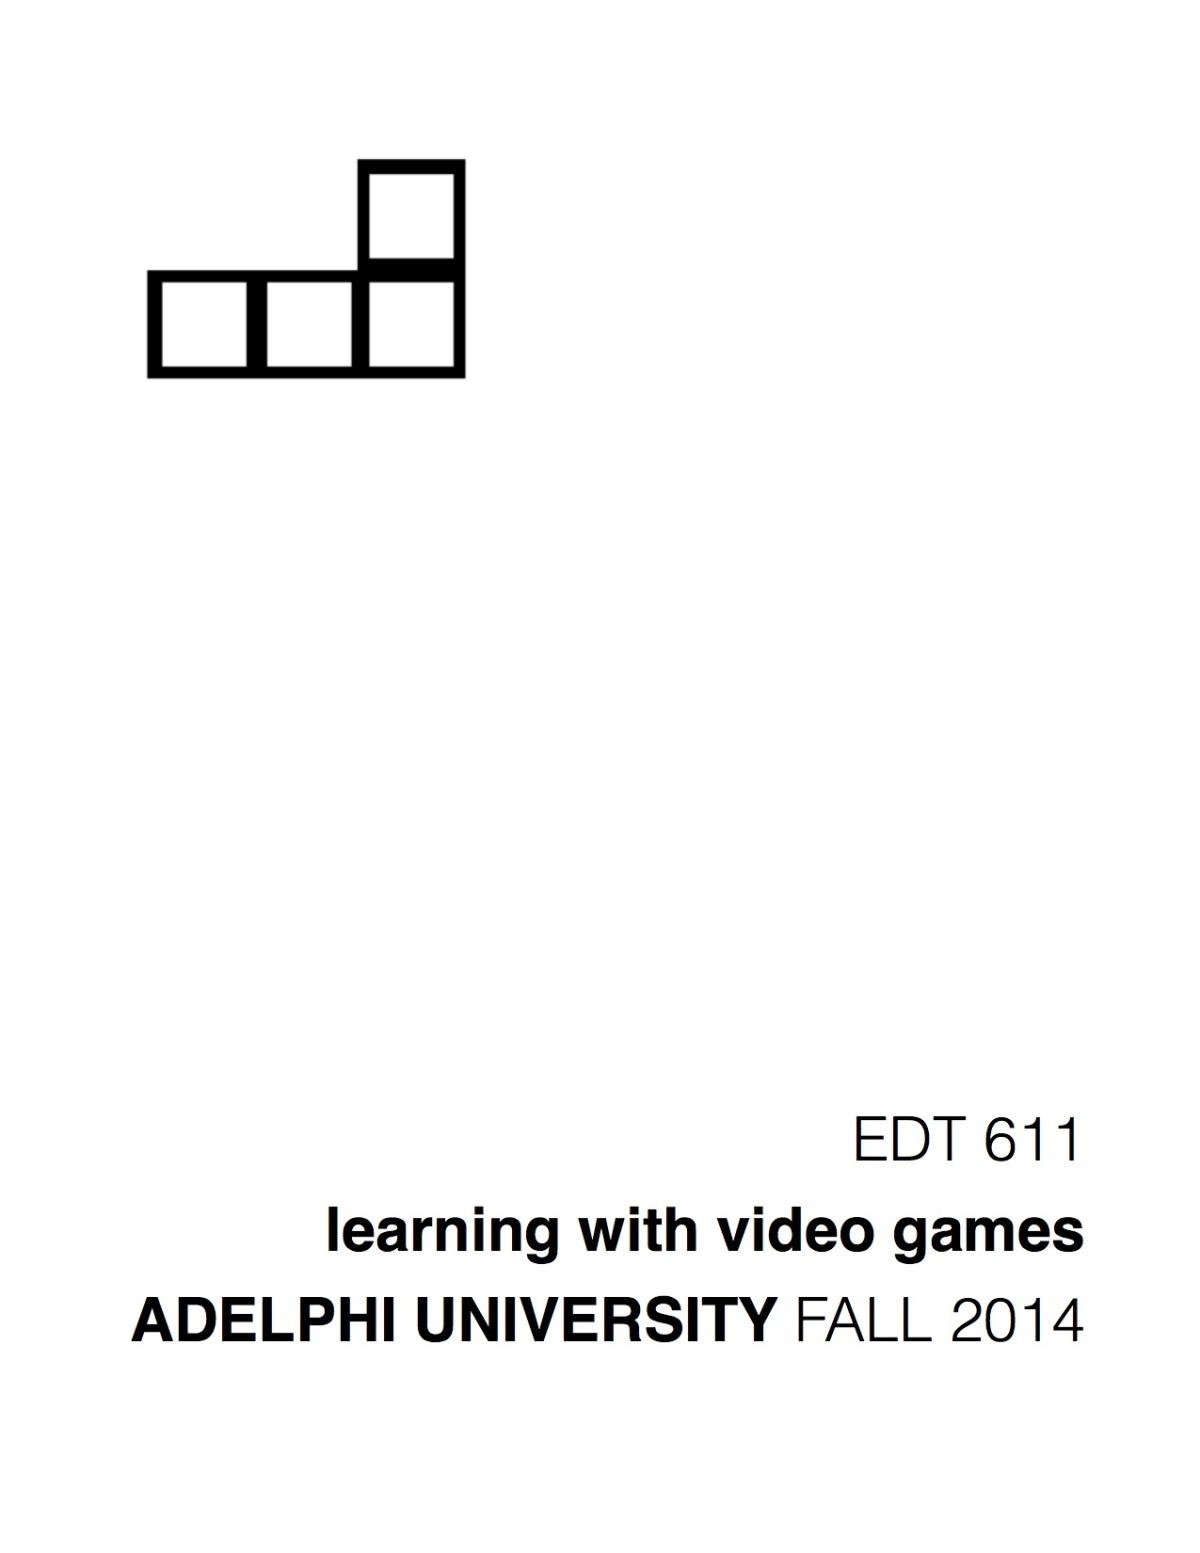 flyer 11 - tetris.jpg